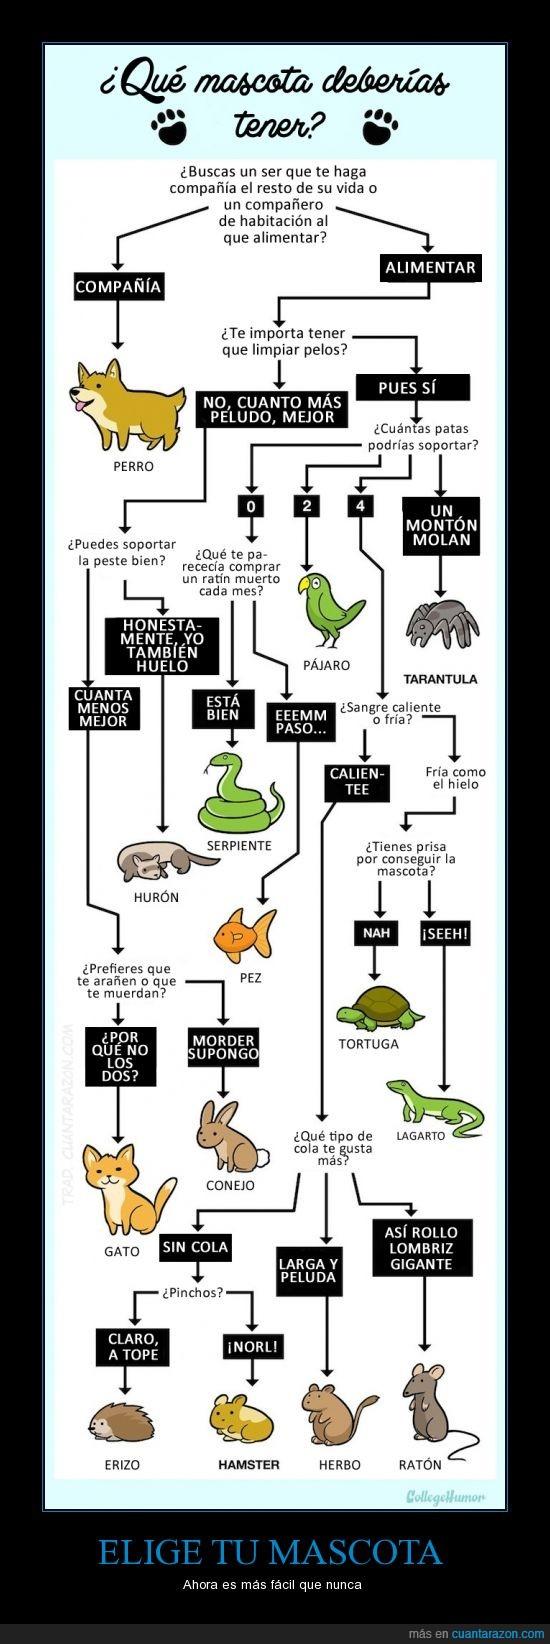 escoger,gato,hamster,herbo,mascota,pelo,perro,raton,serpiente